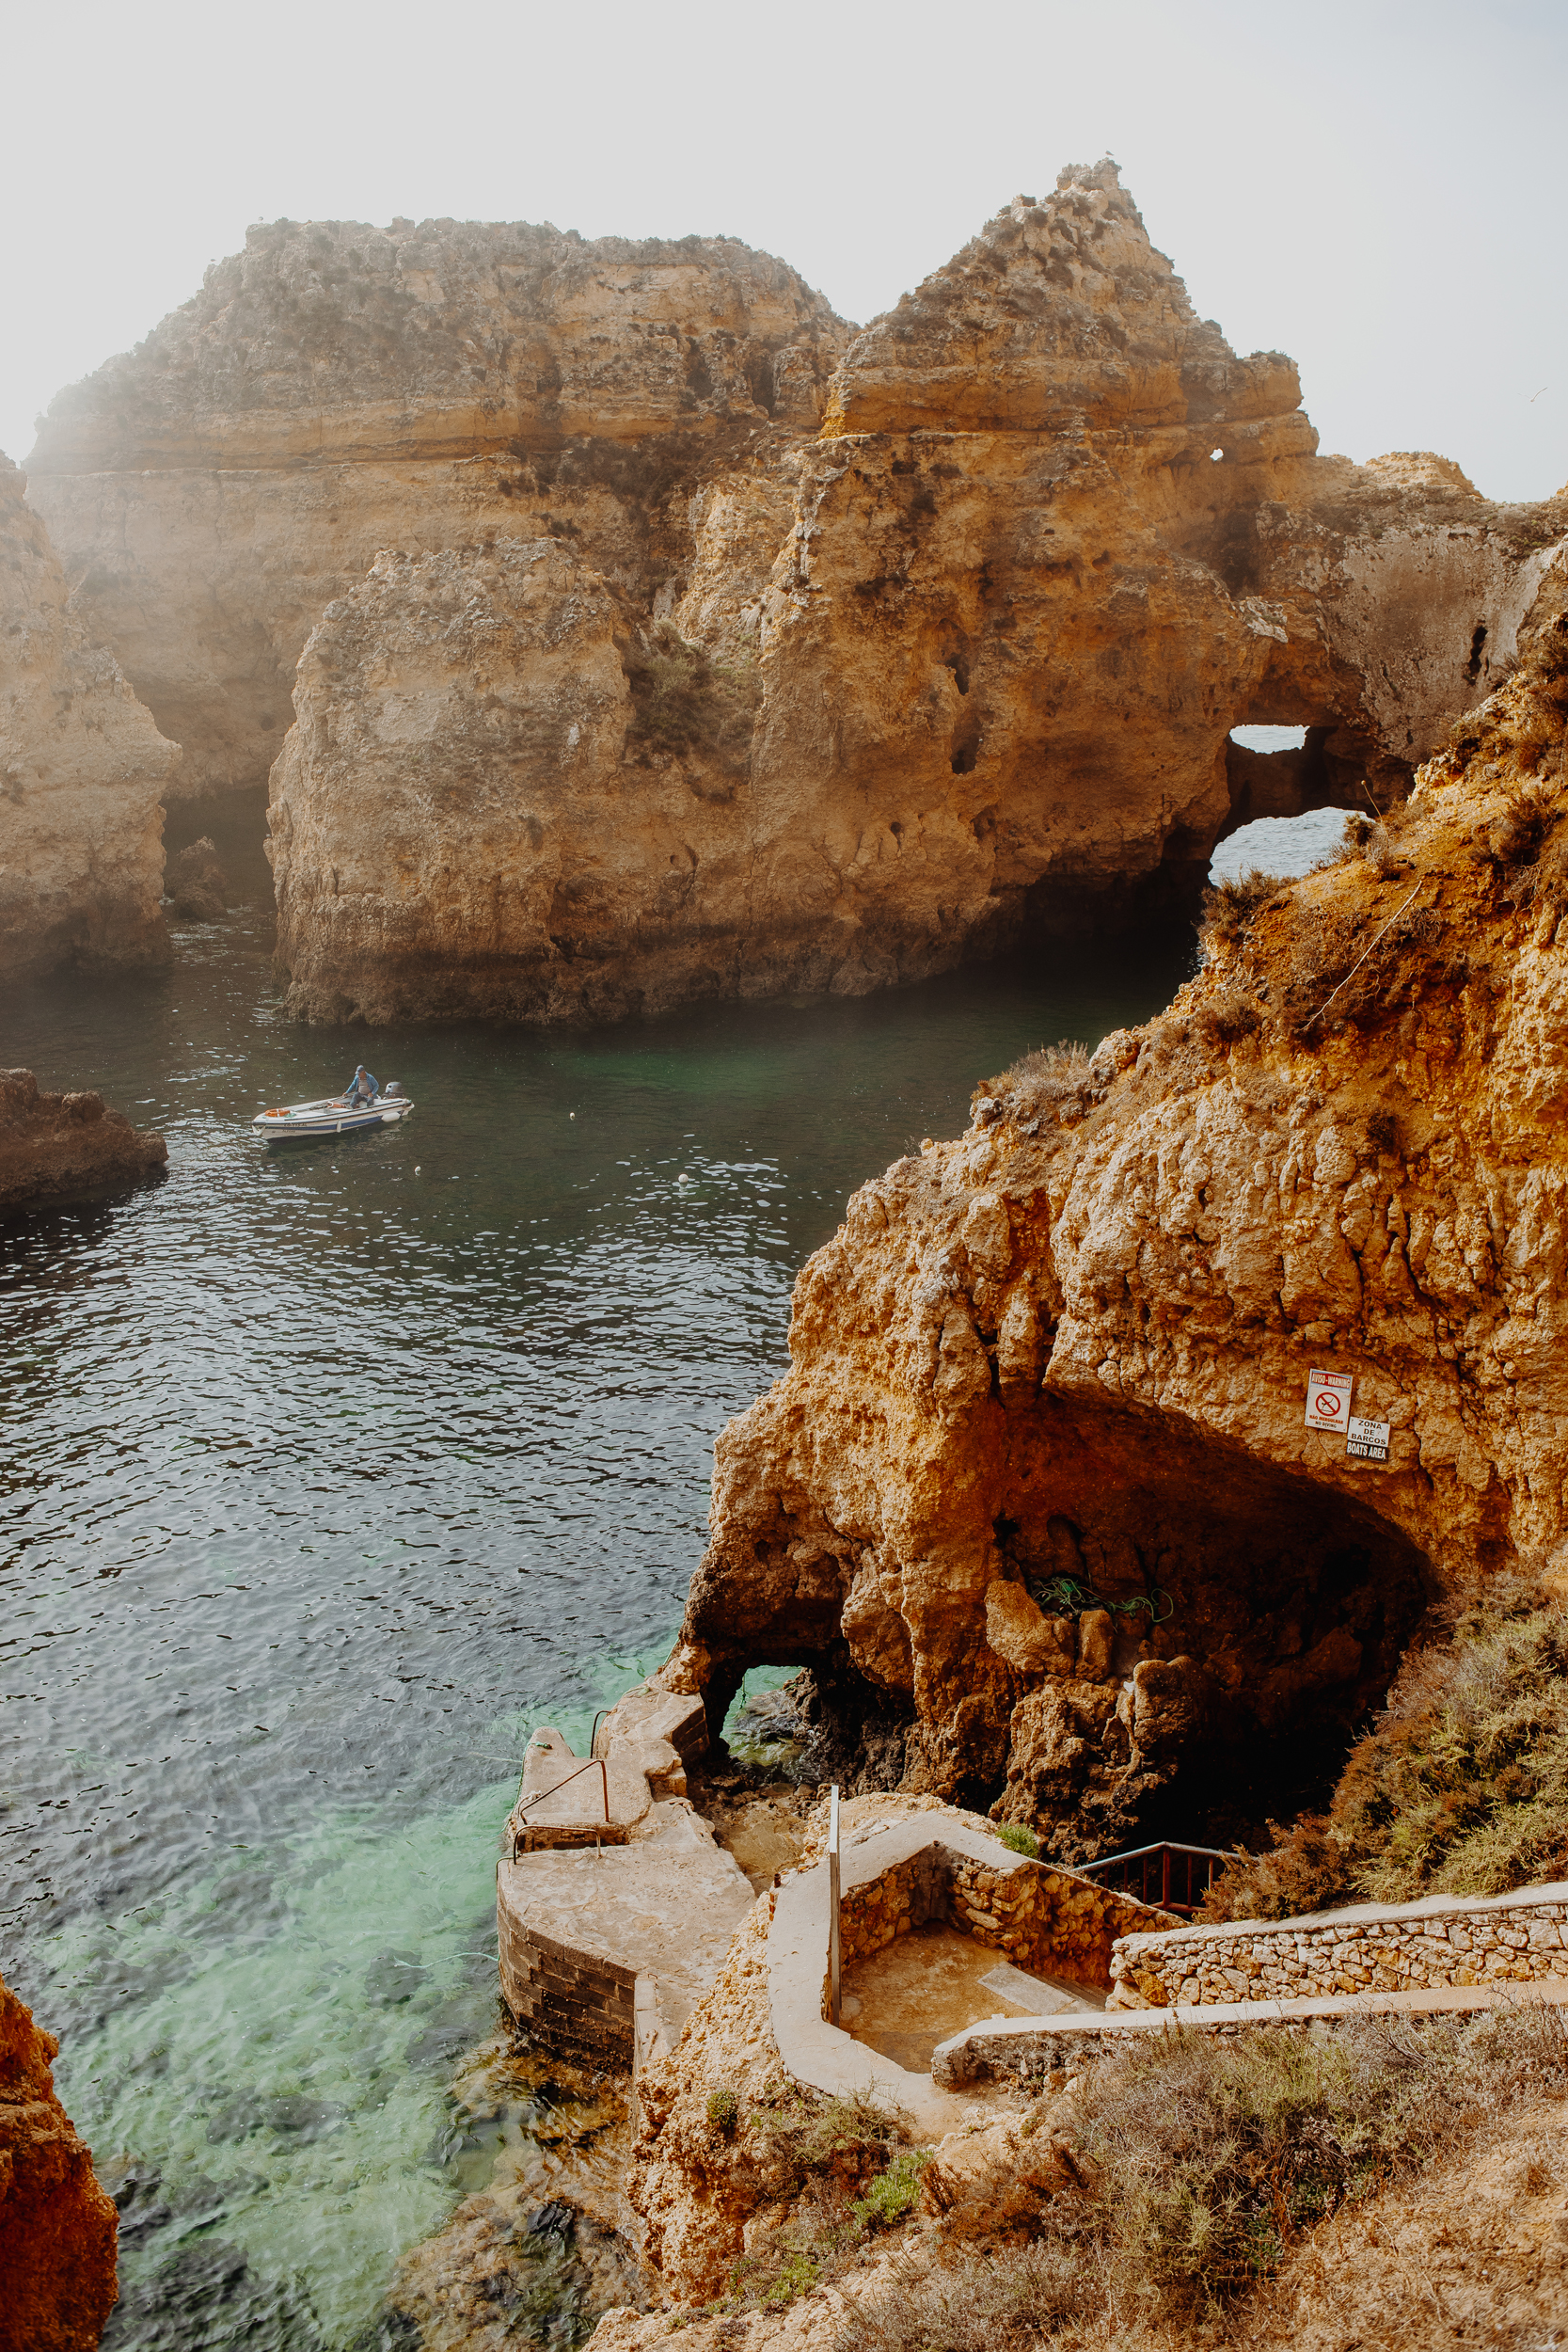 Algarve cliffs: Portugal